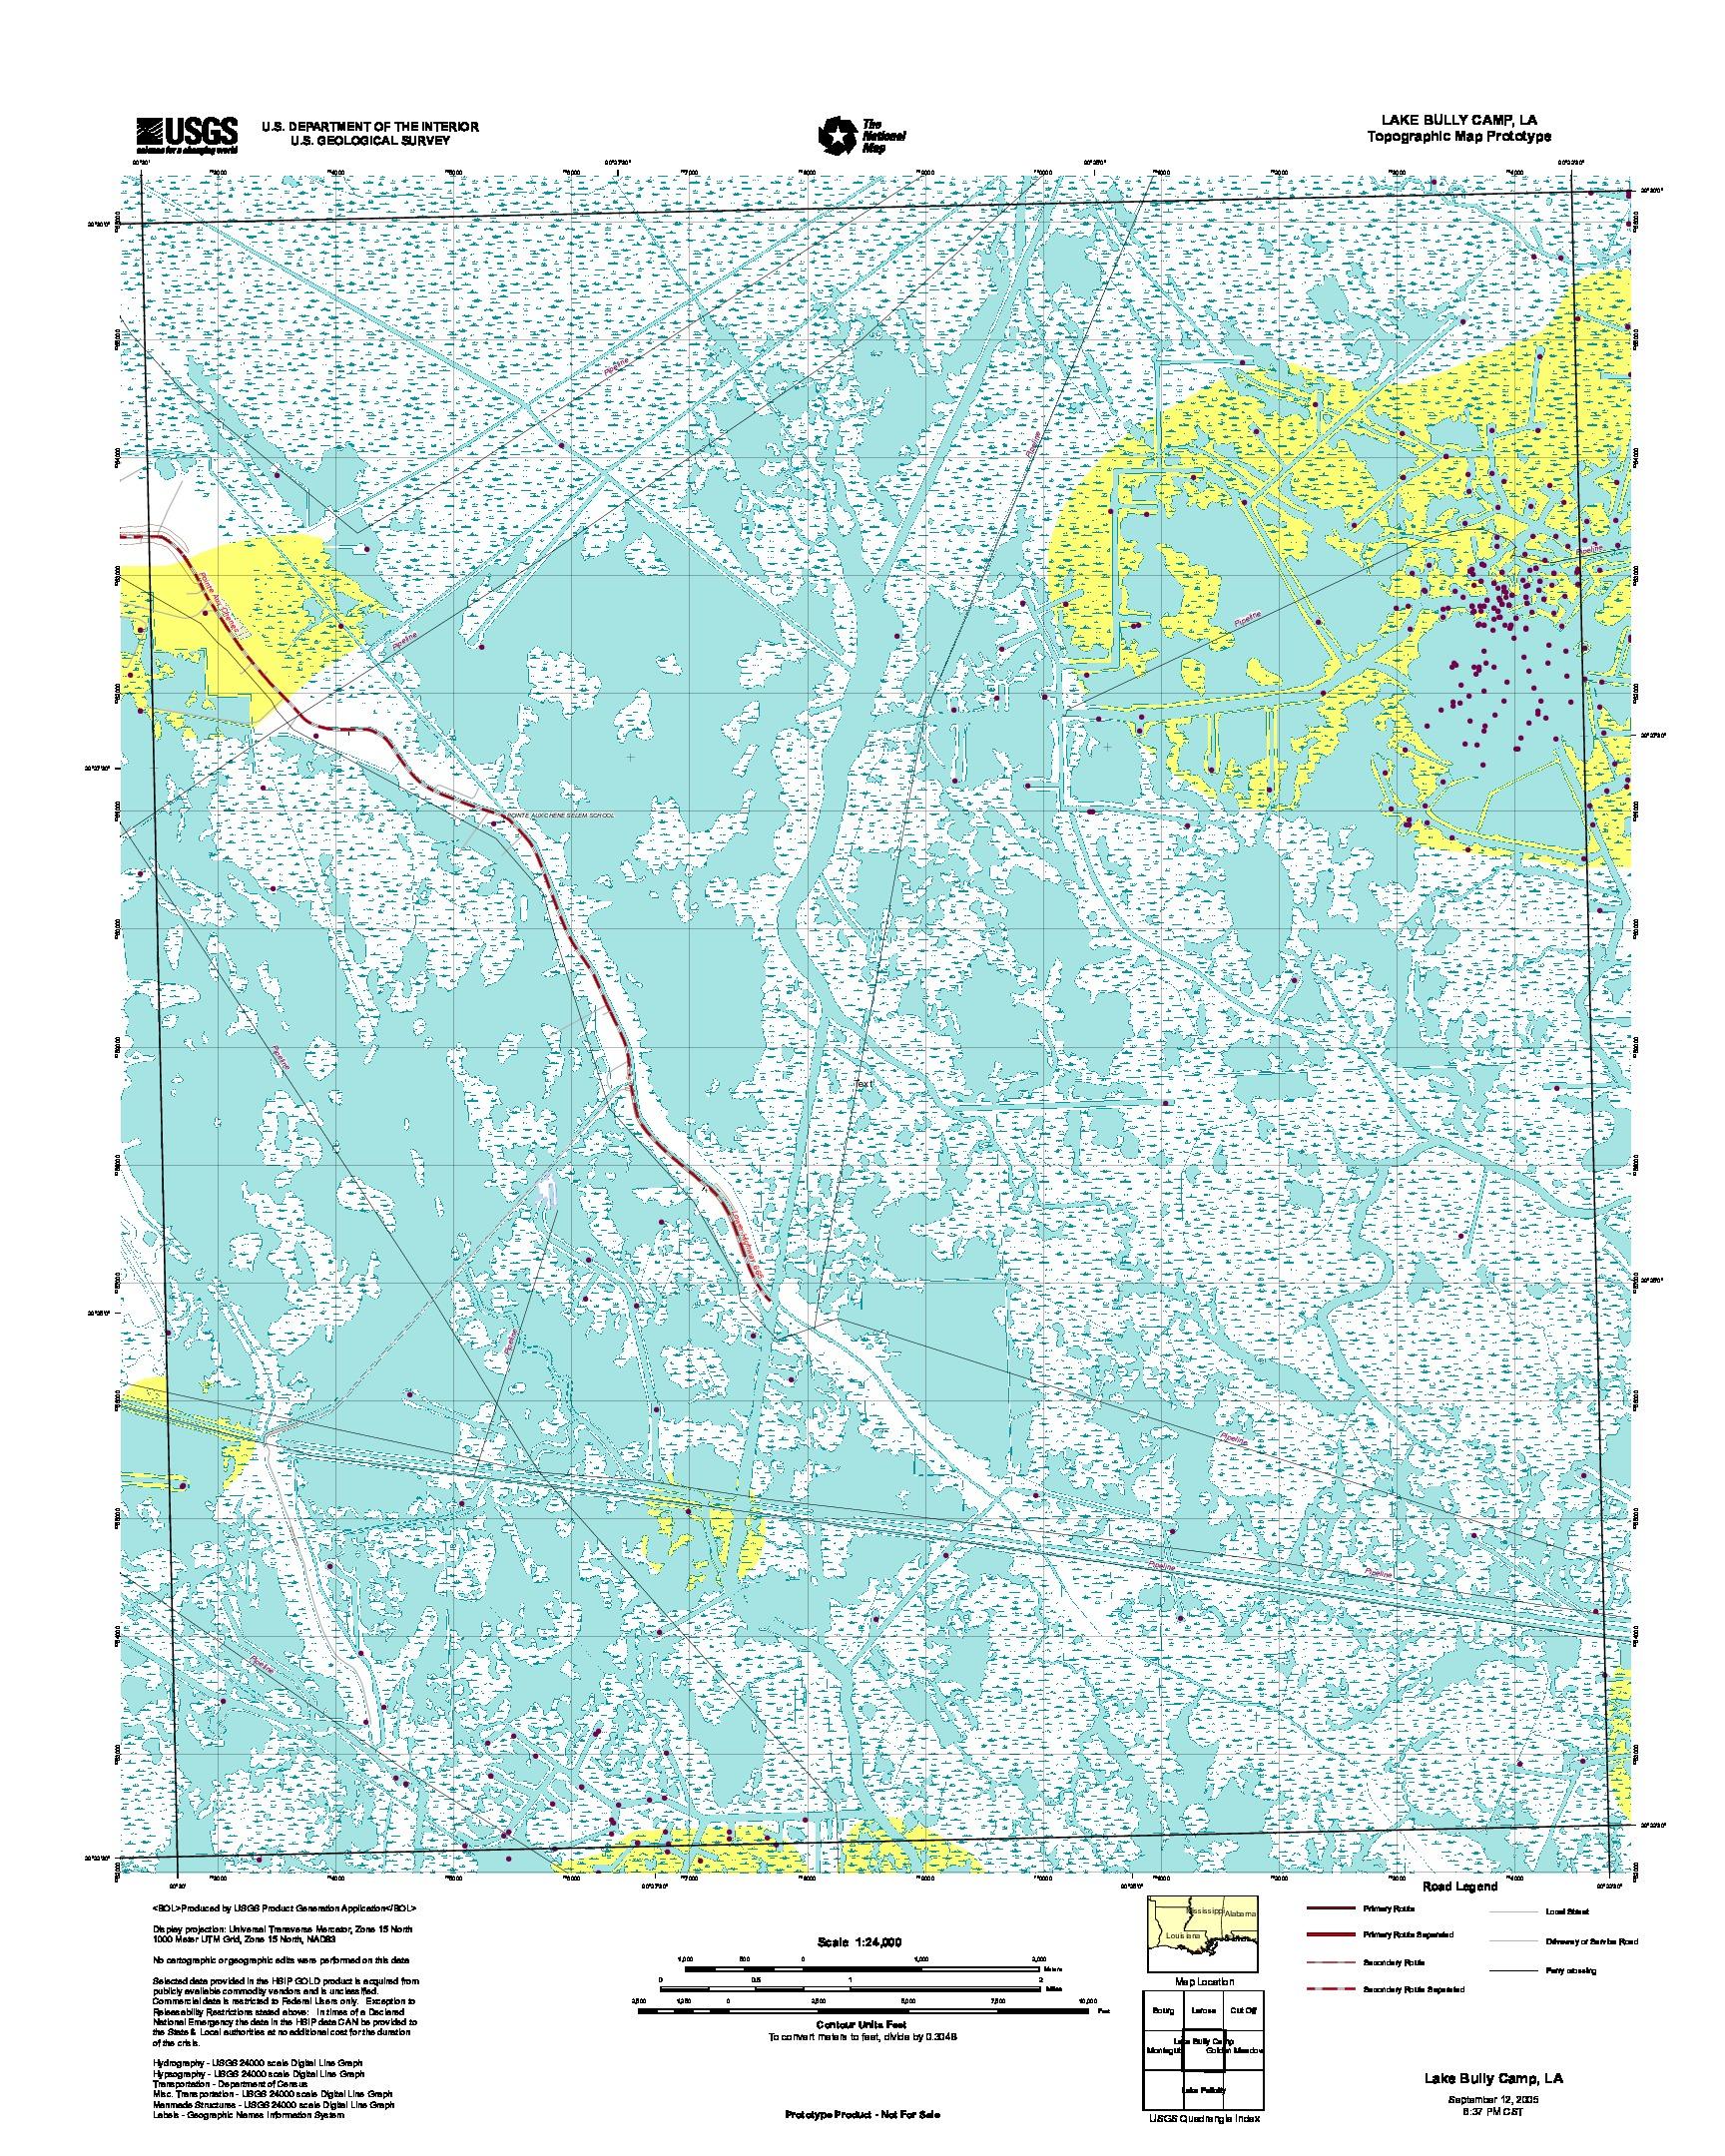 Prototipo de Mapa Topográfico de Lake Bully Camp, Luisiana, Estados Unidos, Septiembre 12, 2005